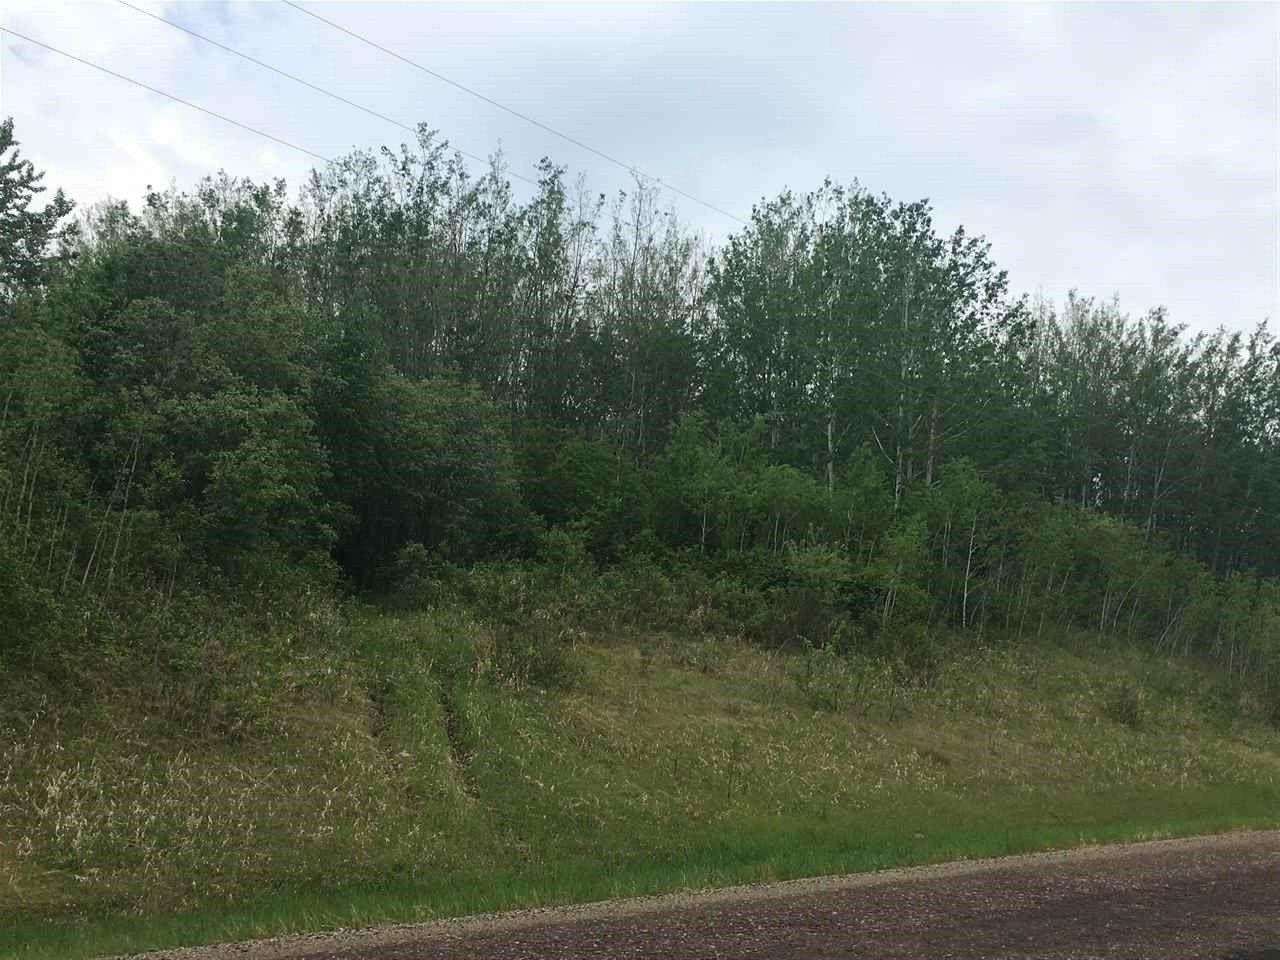 Main Photo: township62 RG RD 411: Rural Bonnyville M.D. Rural Land/Vacant Lot for sale : MLS®# E4100378